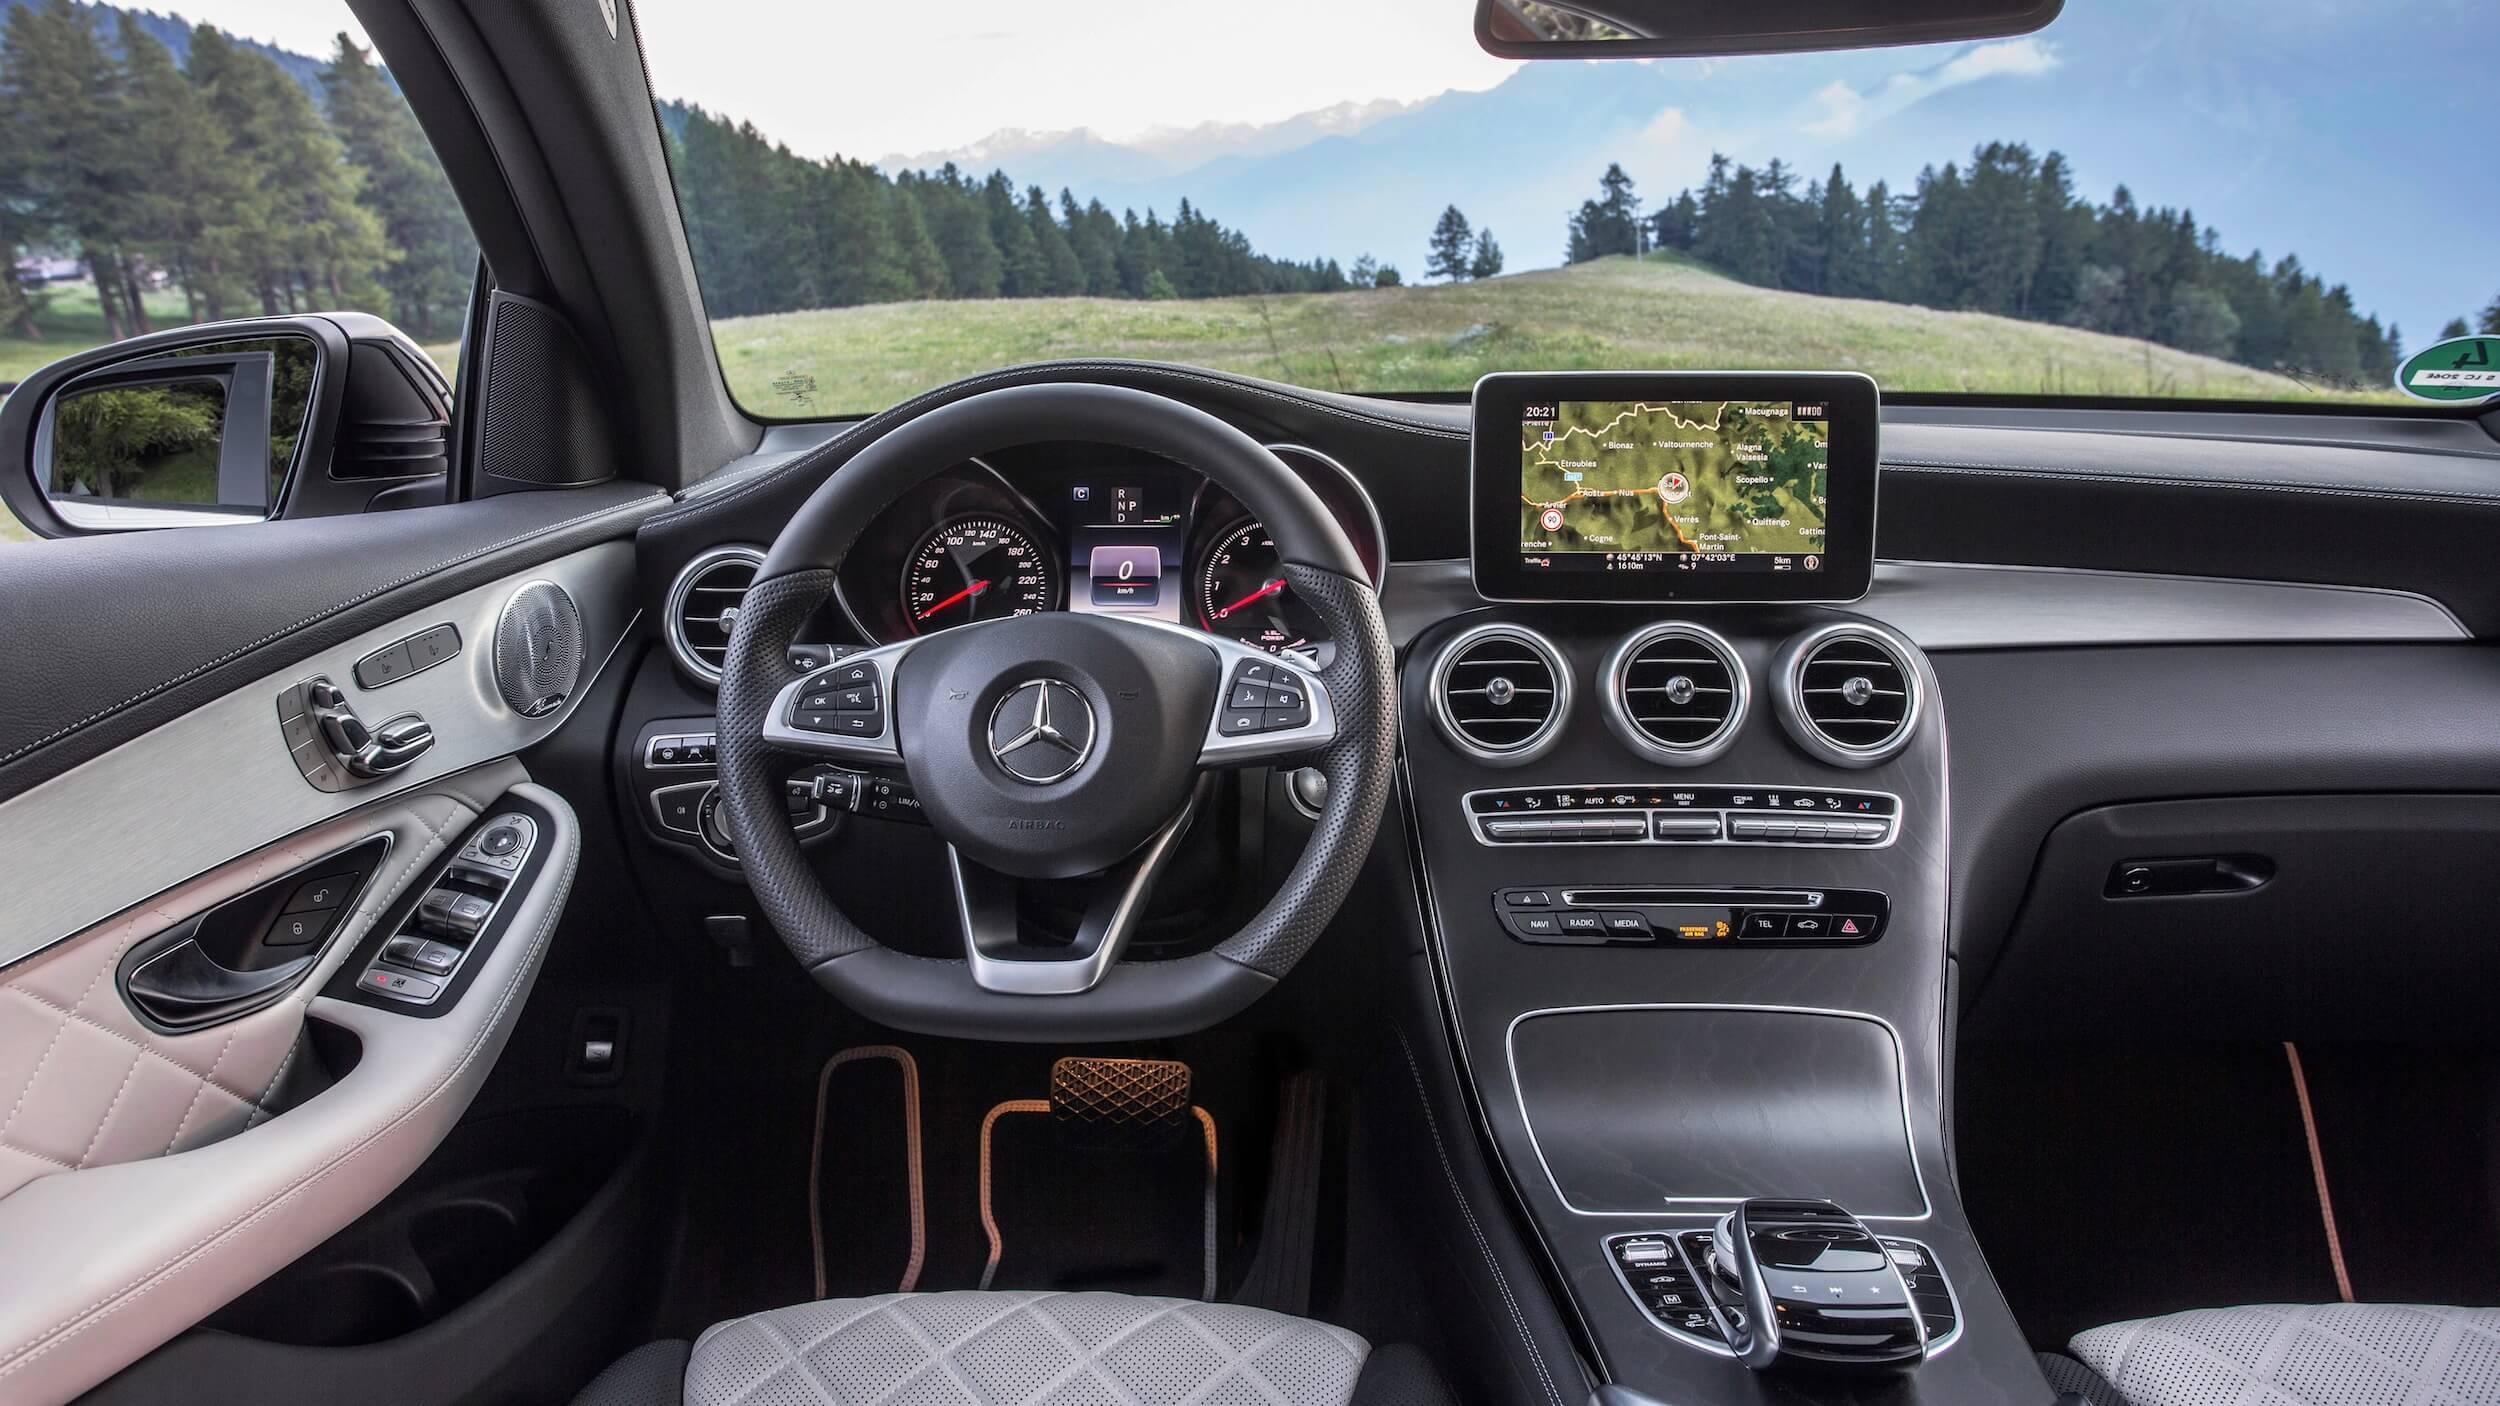 Mercedes GLC dashboard